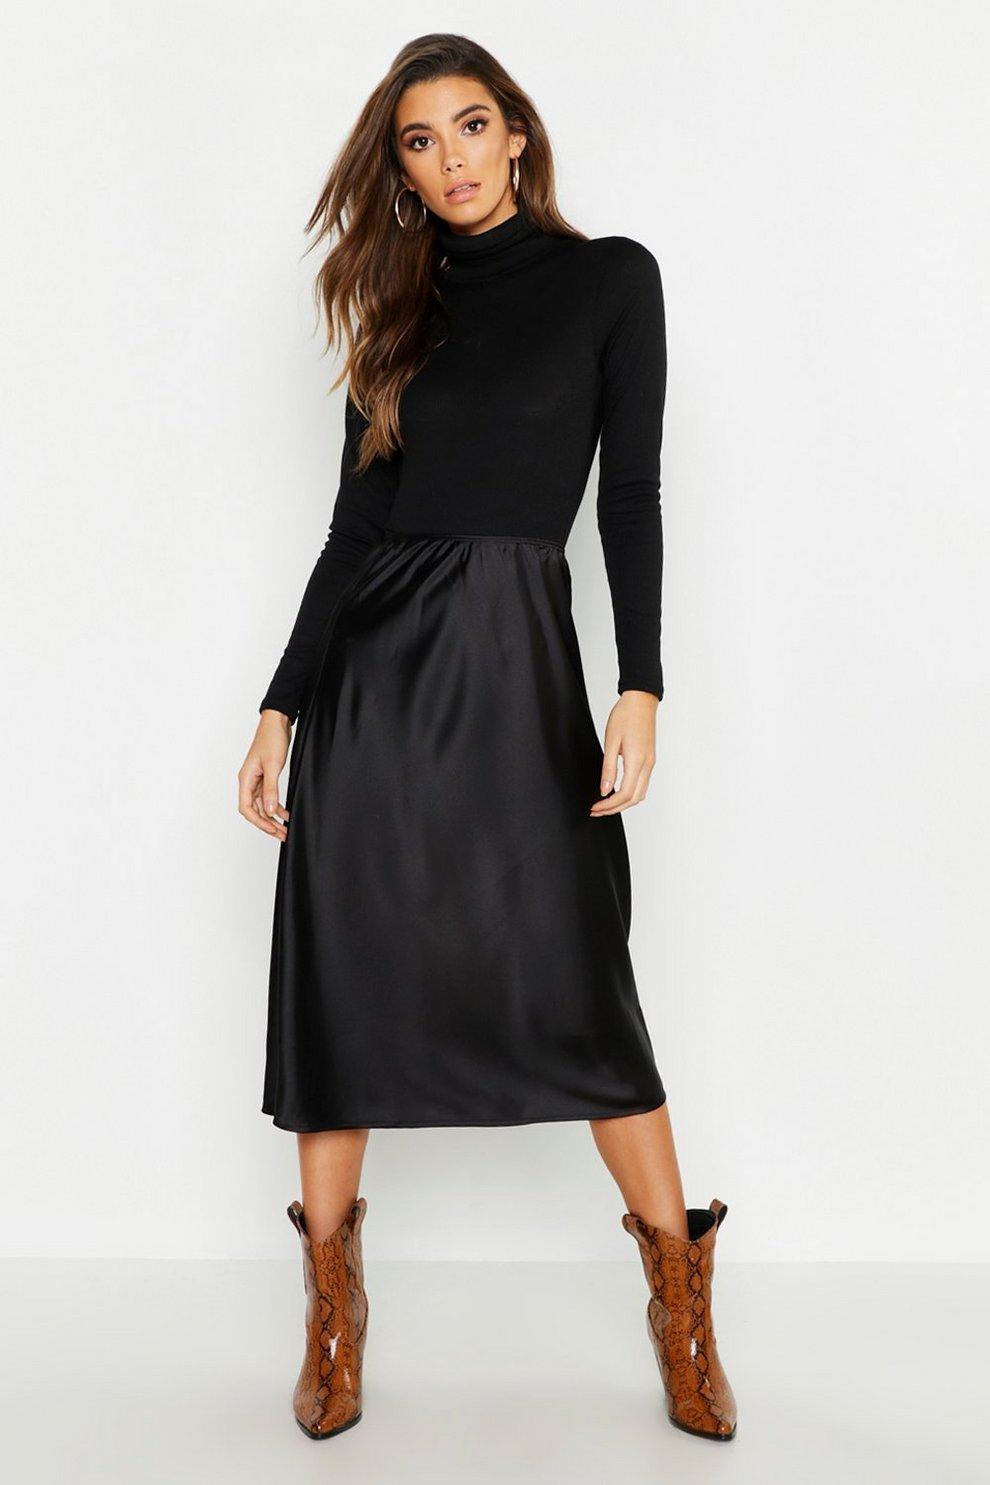 c318dee8fe Womens Black Satin Bias Cut Slip Midi Skirt